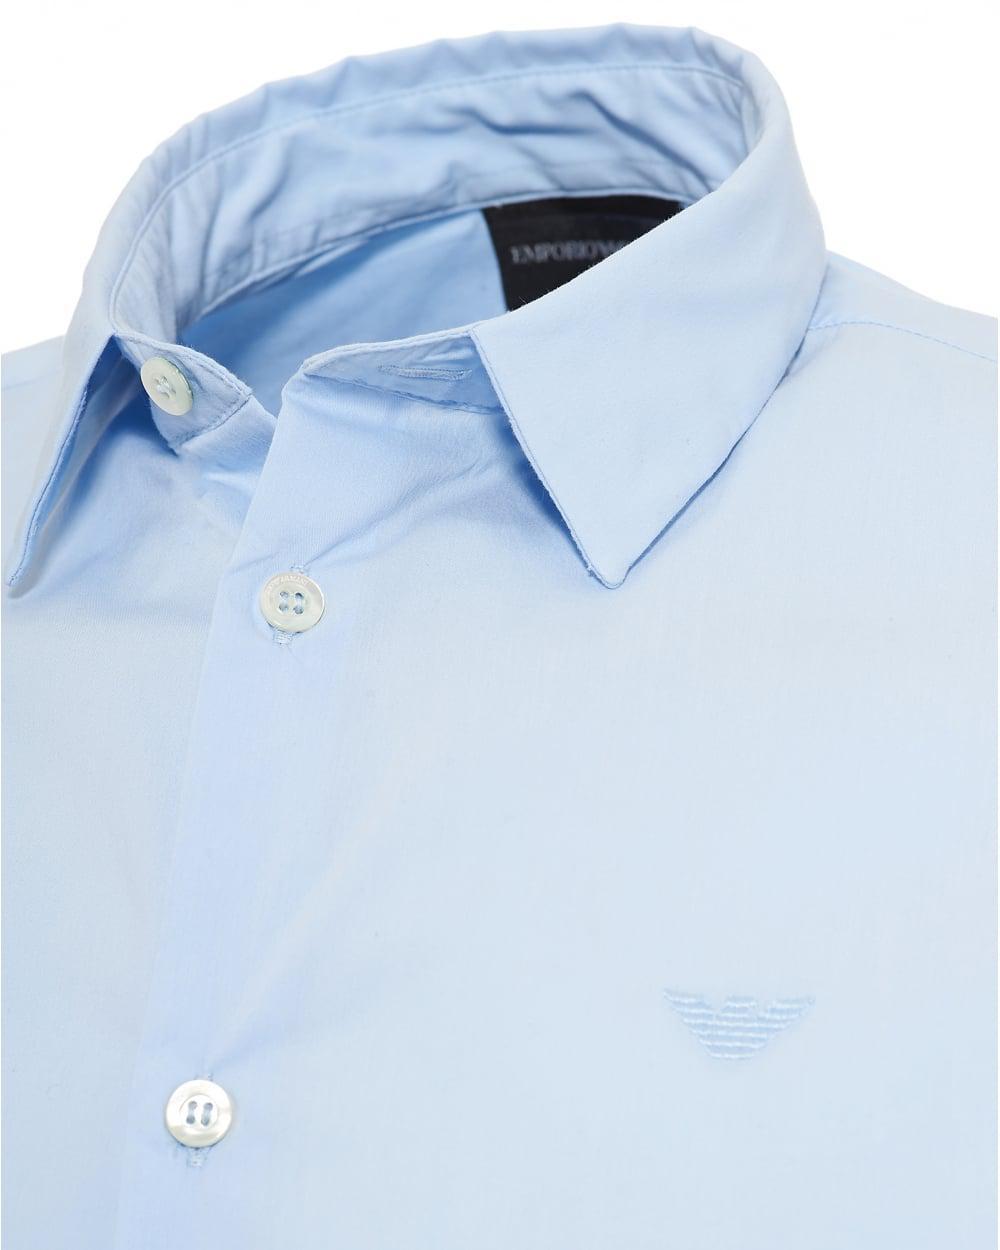 1e2b2be9 Emporio Armani Poplin Stretch Shirt, Slim Fit Sky Blue Shirt in Blue ...